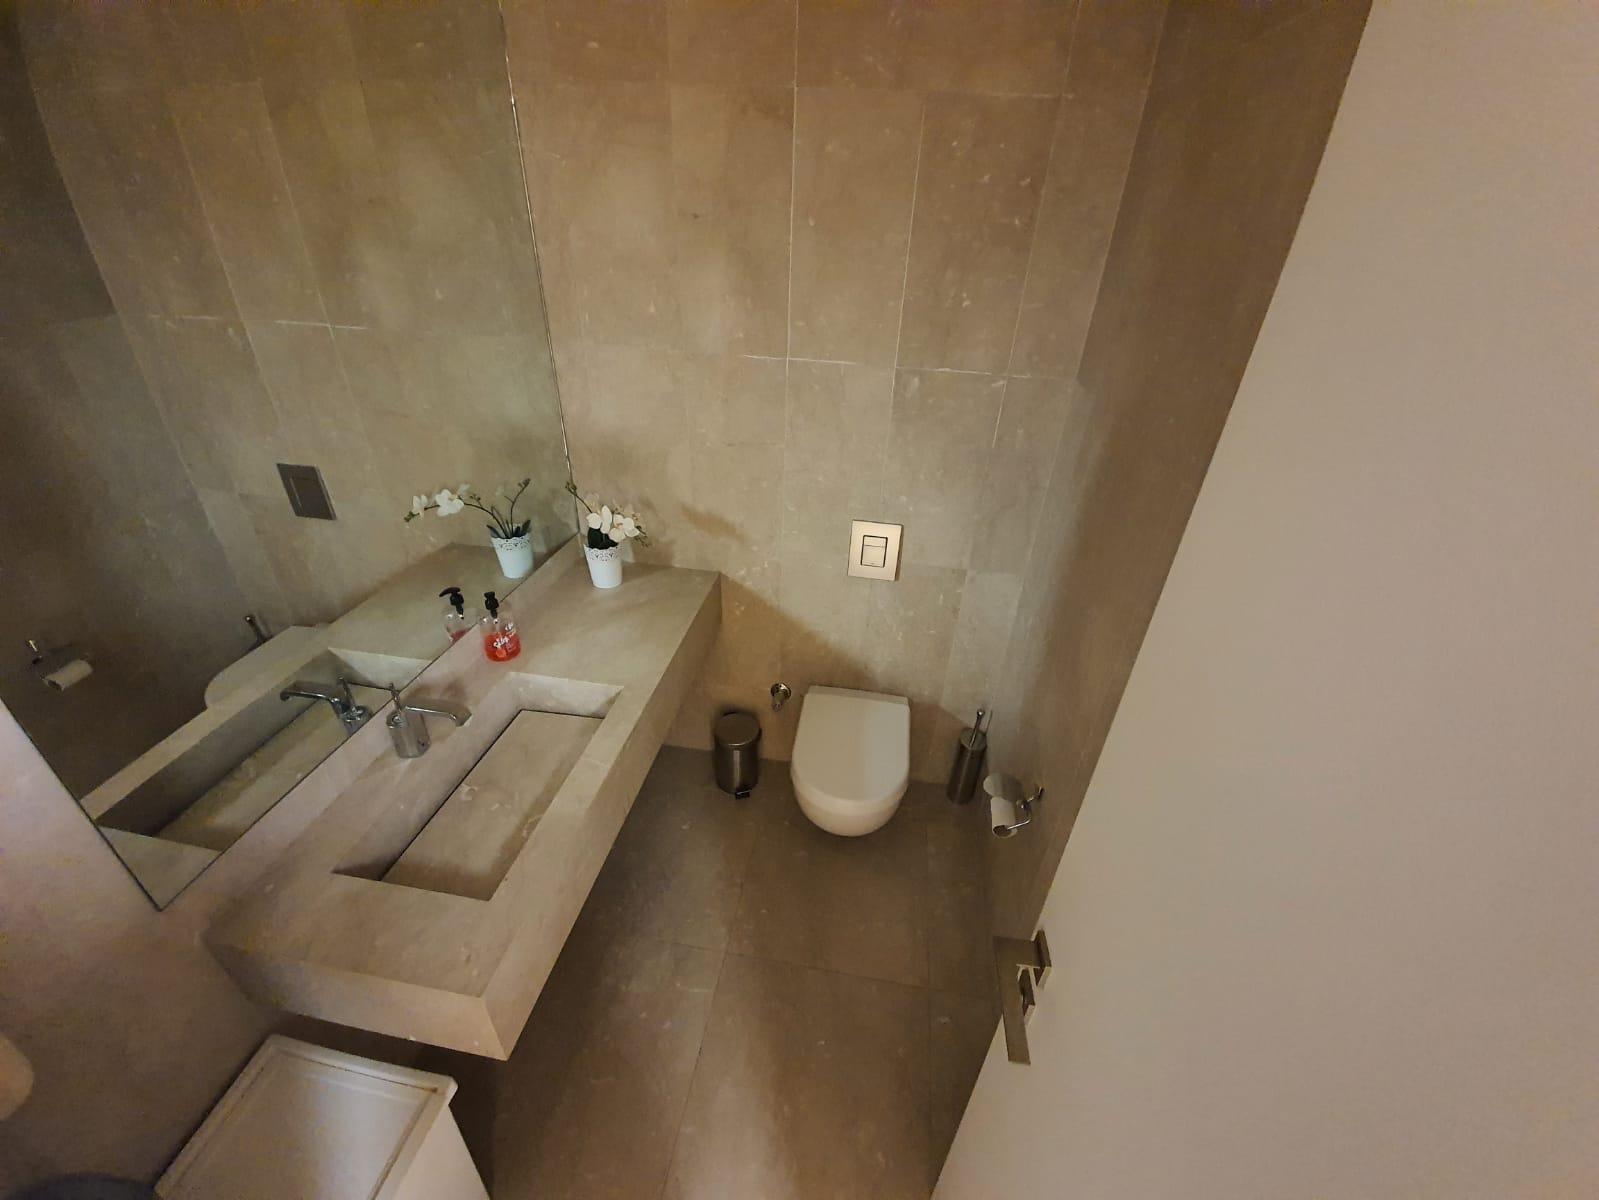 apartments-residence-sapphire-tower-11th-floor-002.jpg